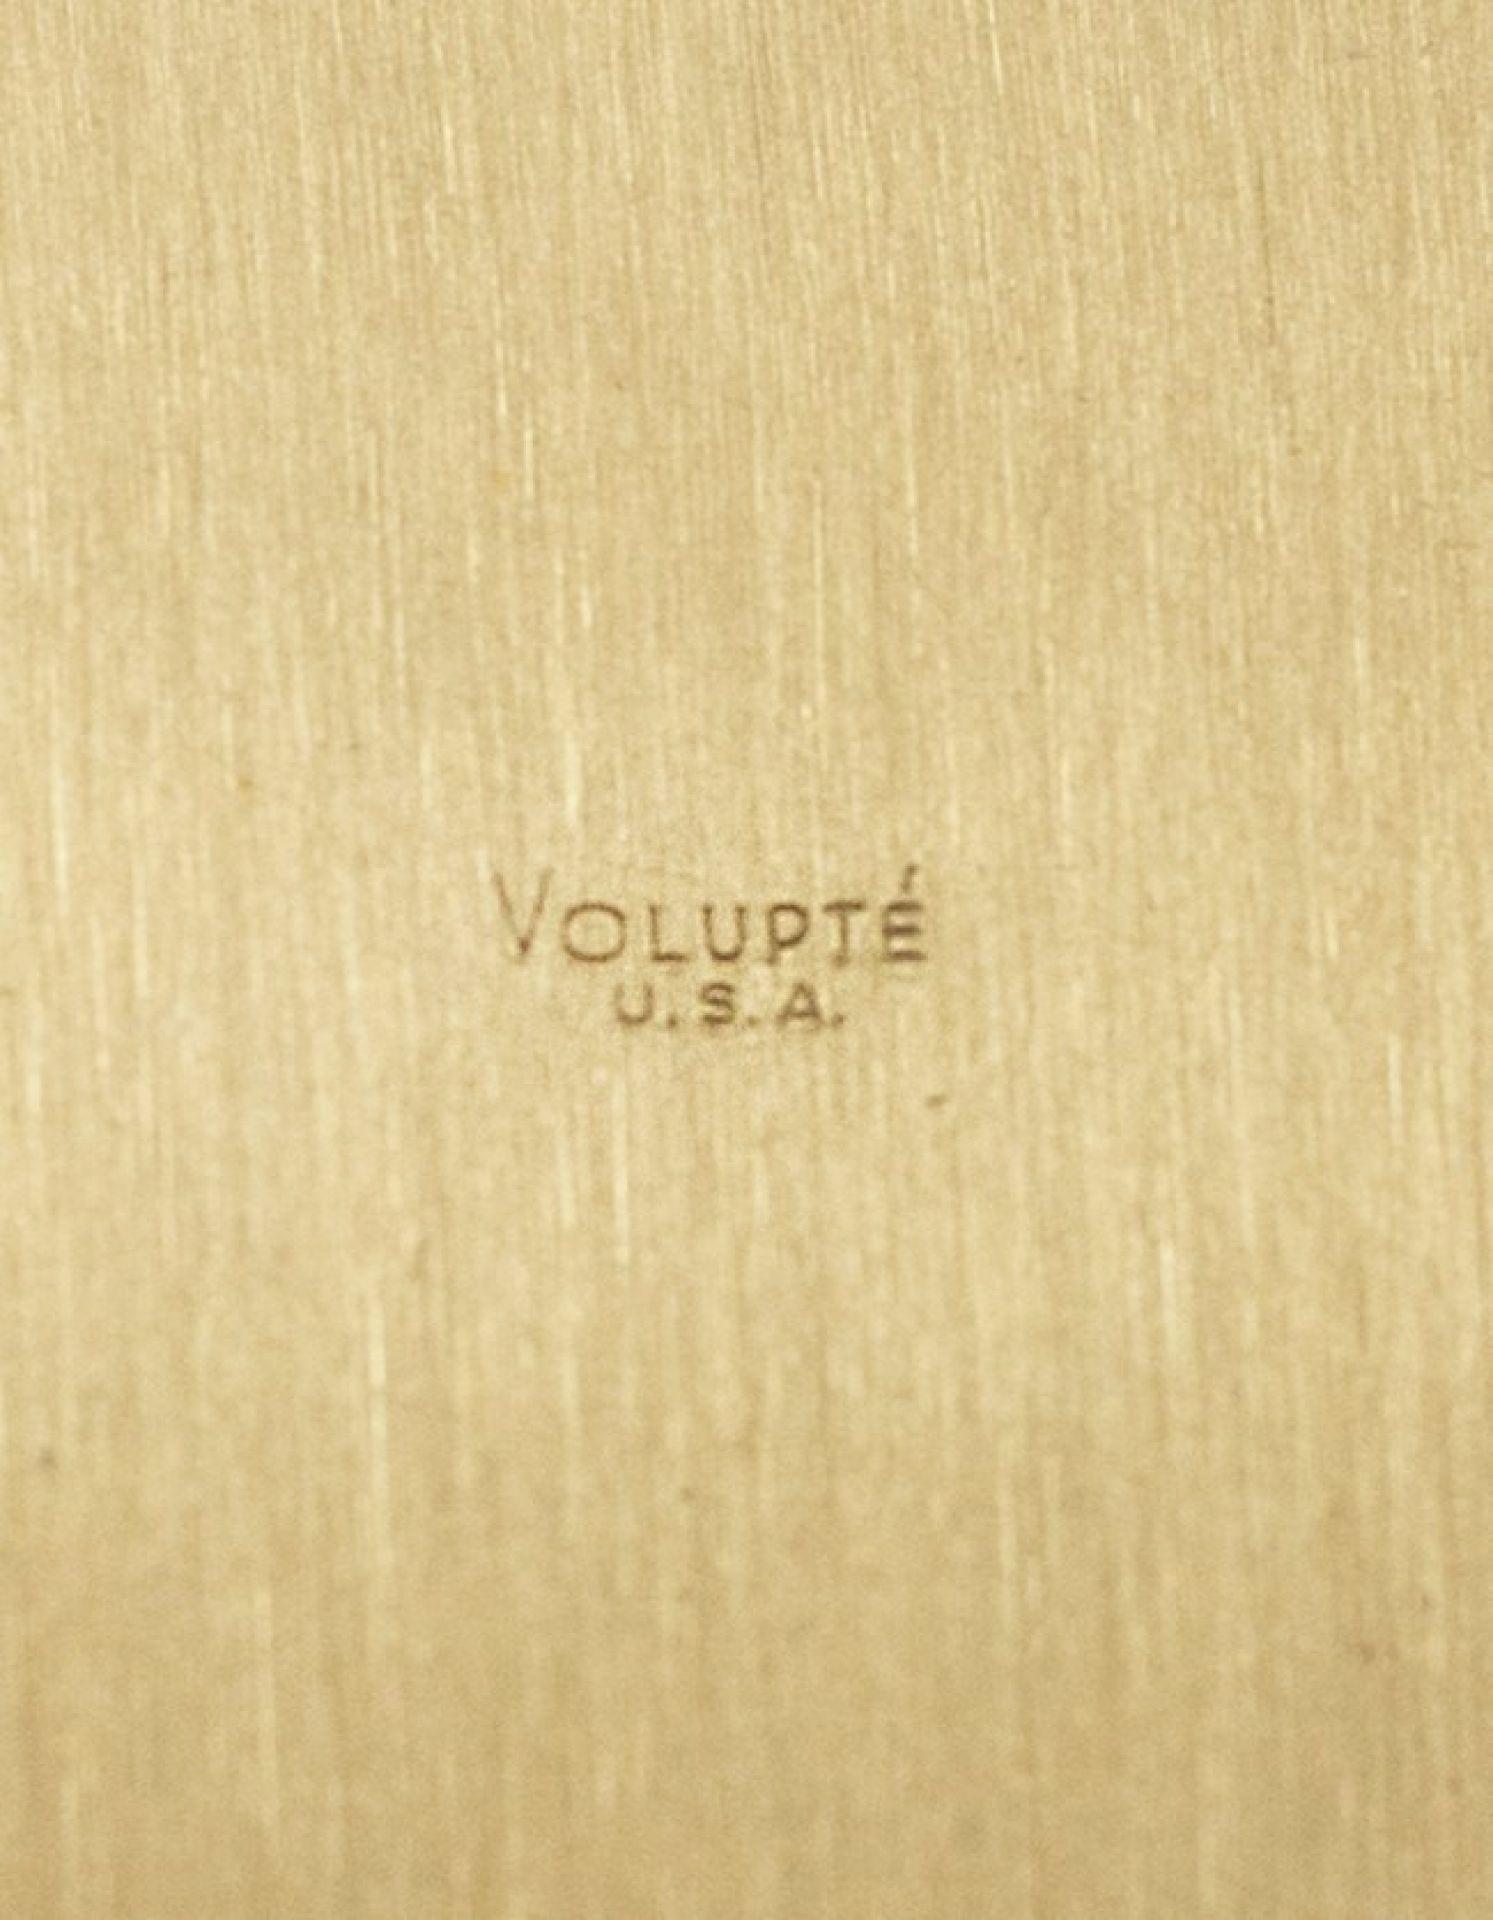 Volupte Goldtone 1950's Vintage Compact Purse